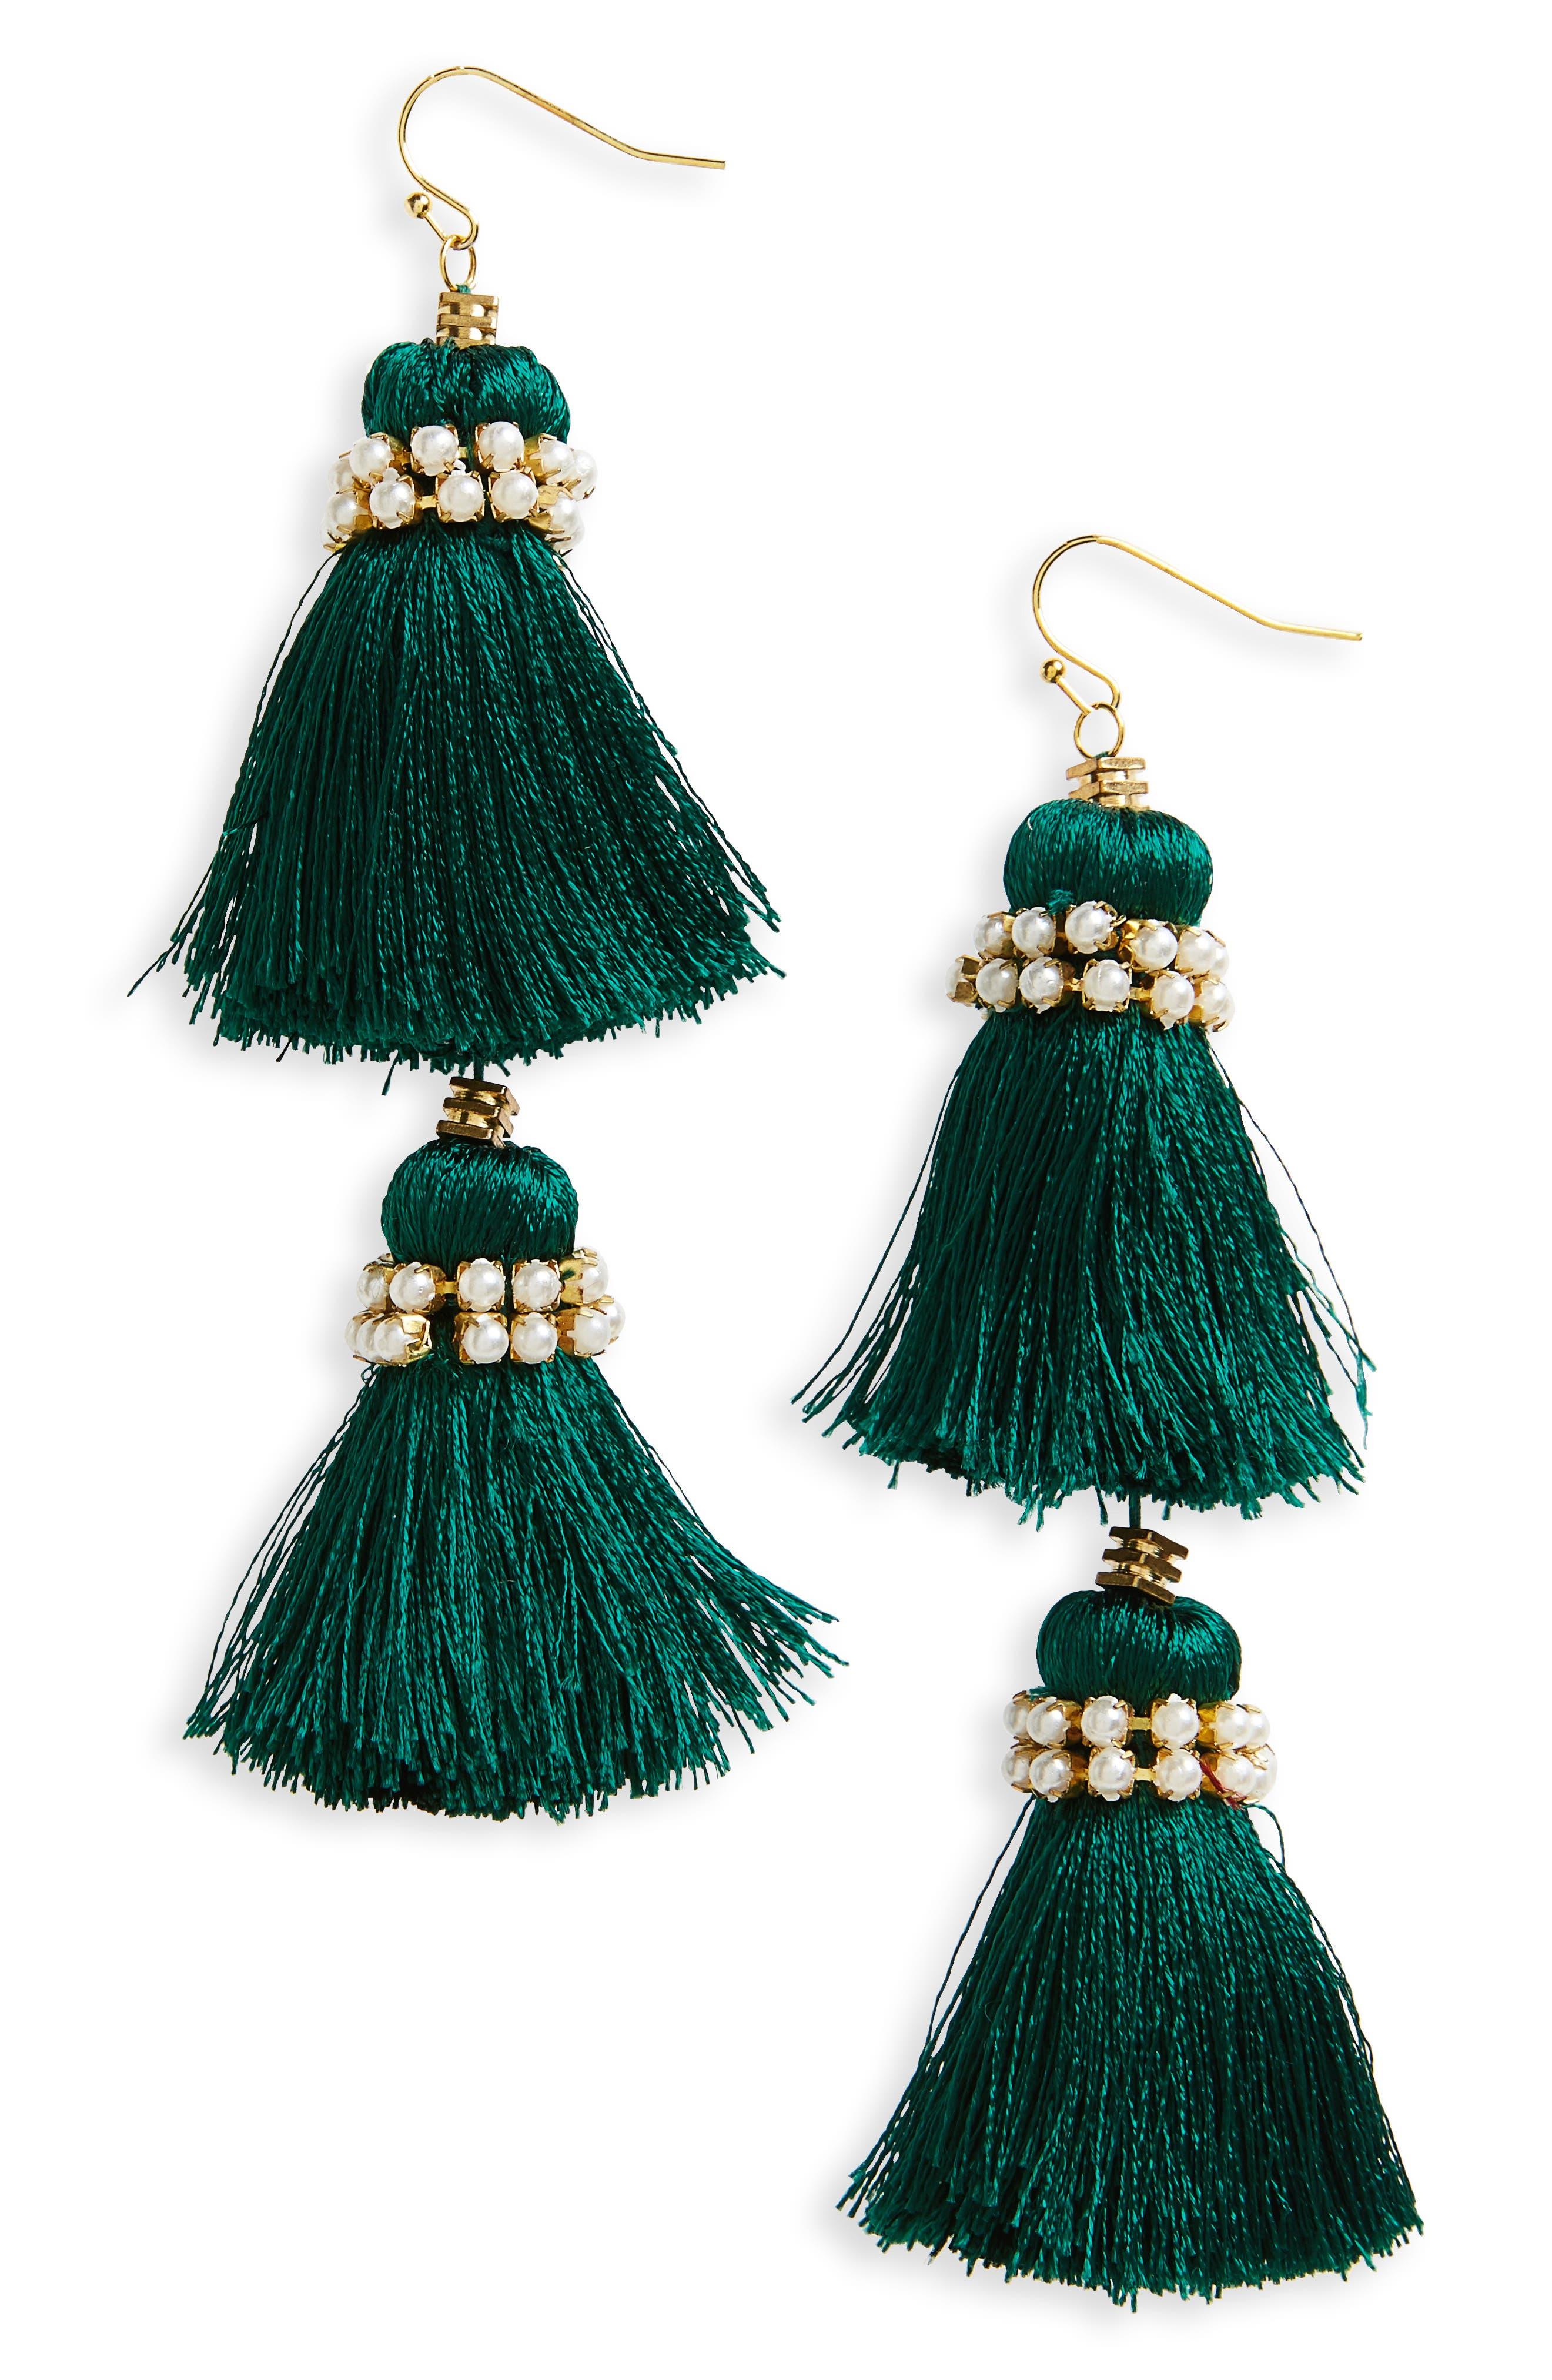 Main Image - New Friends Colony Imitation Pearl & Tassel Earrings